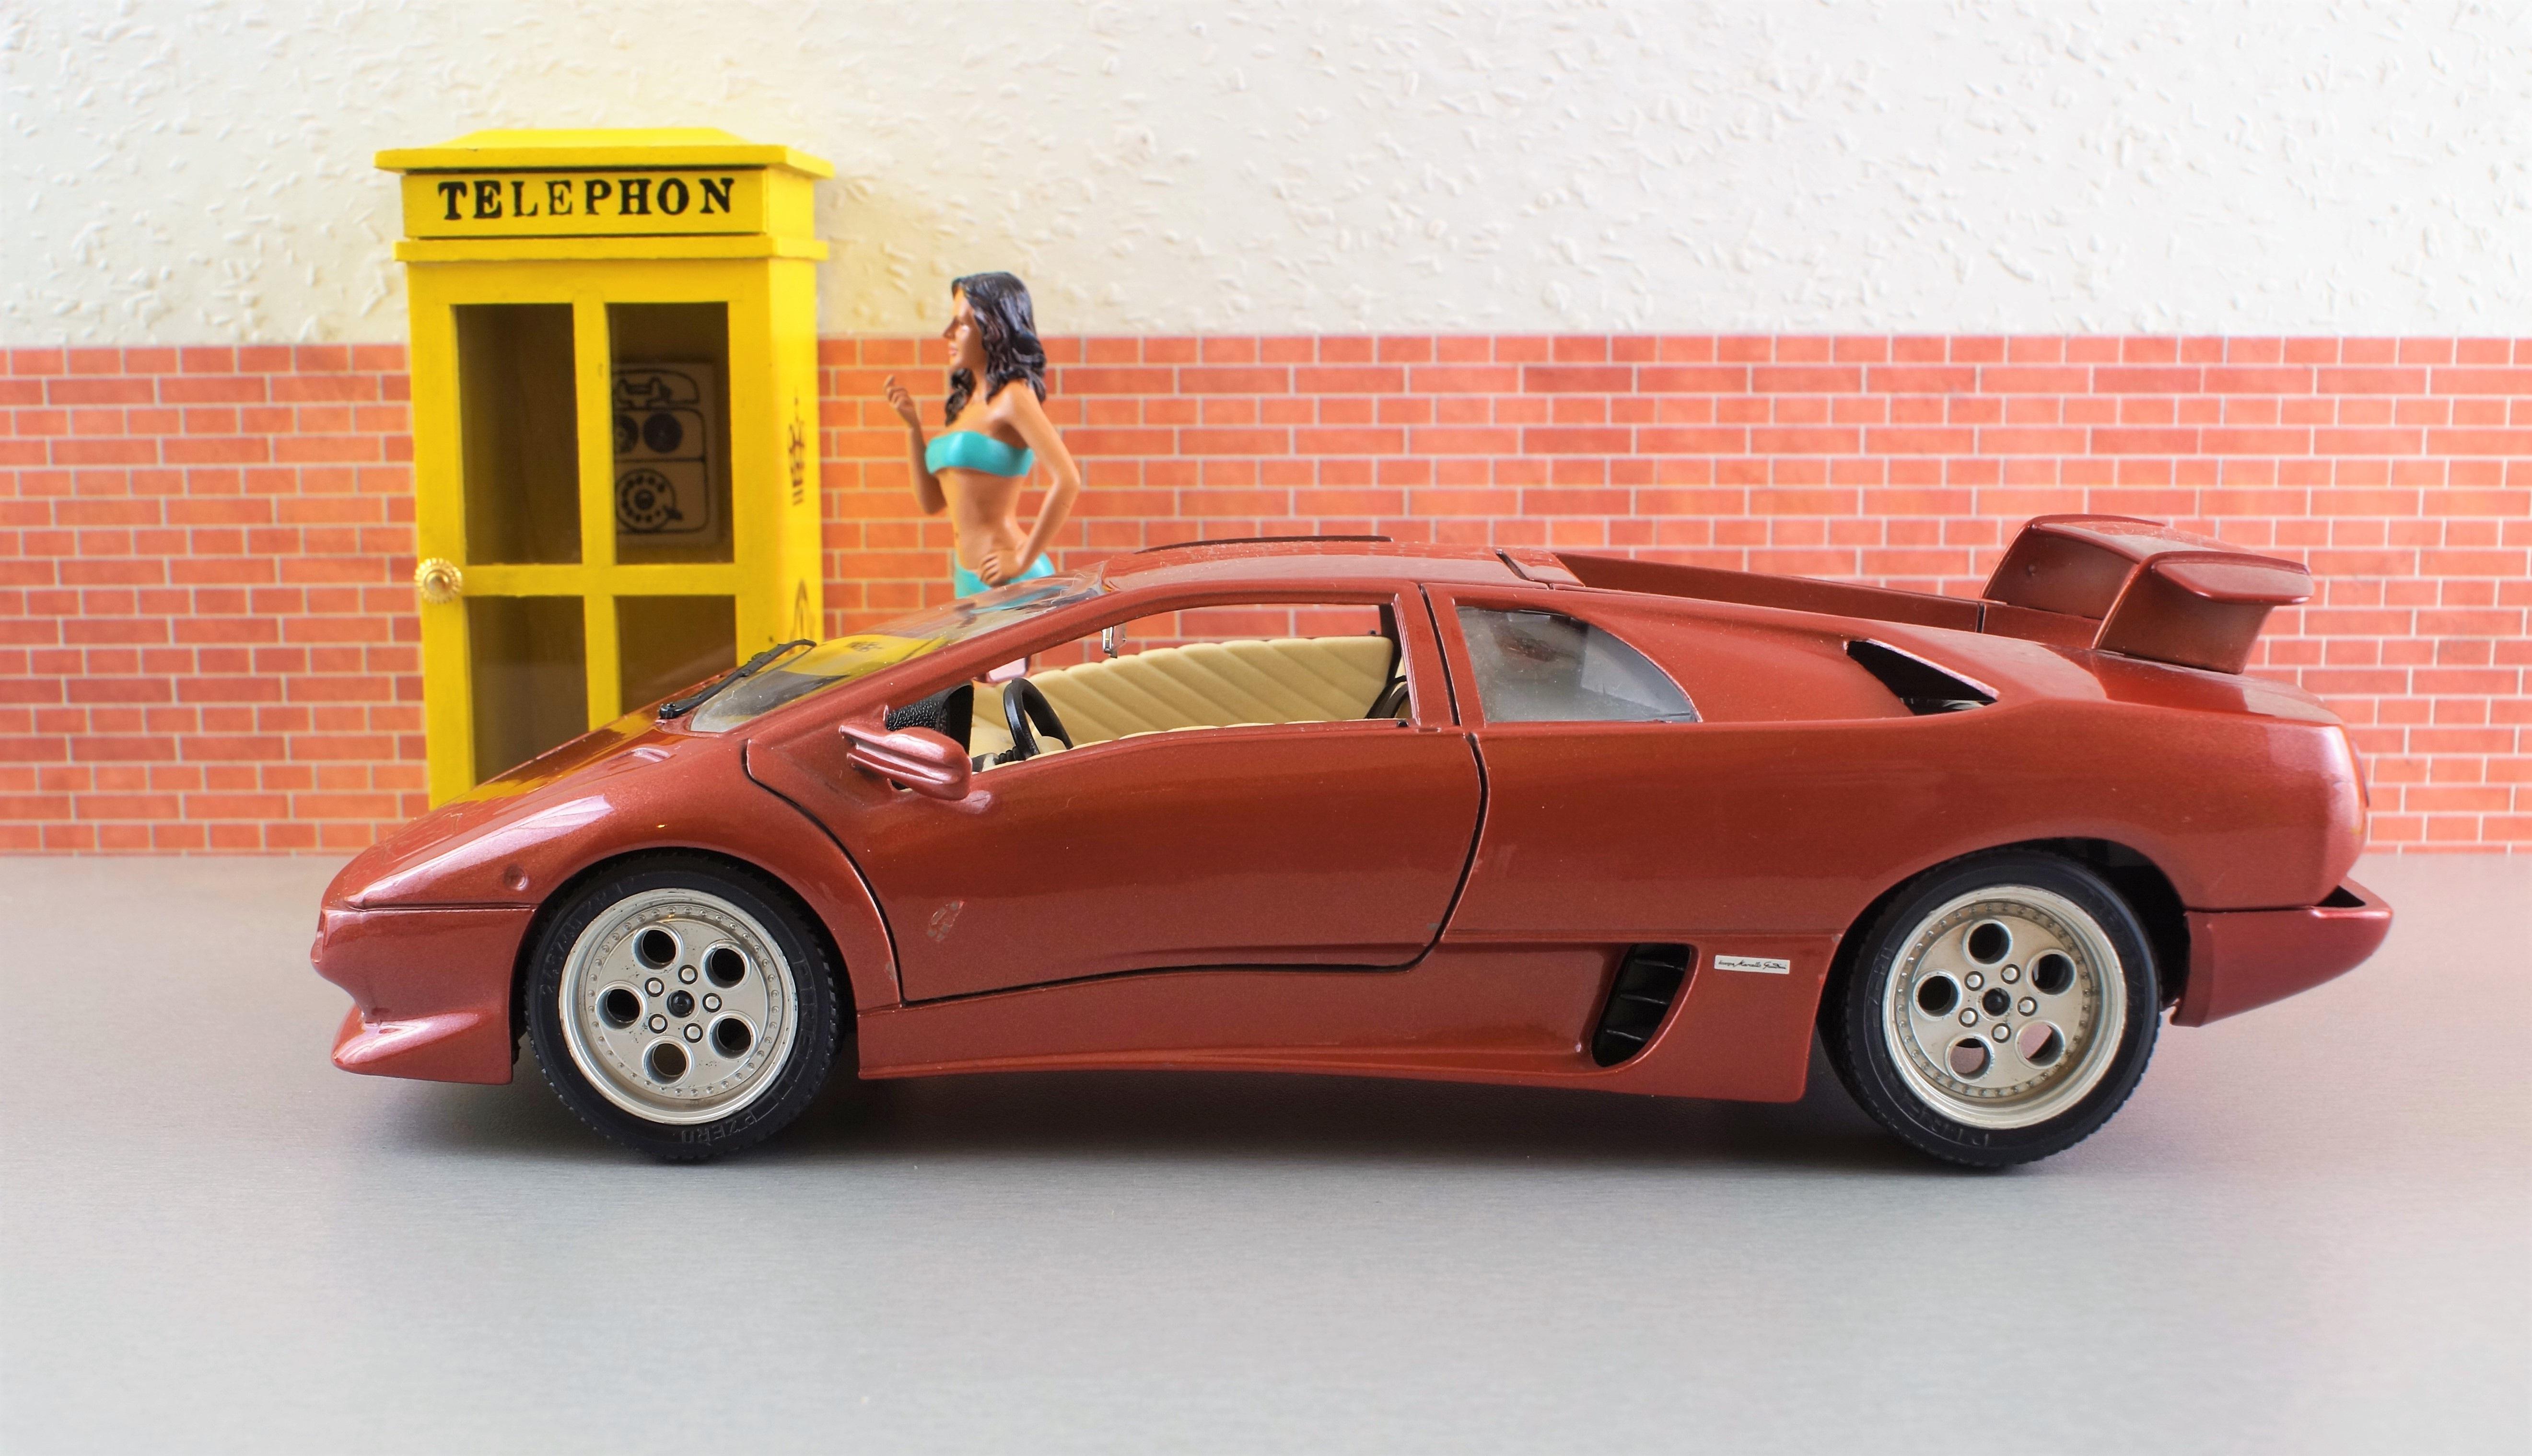 Model Car Lamborghini Diablo Vehicles Model Automotive Toys Sports Car Auto  Oldtimer